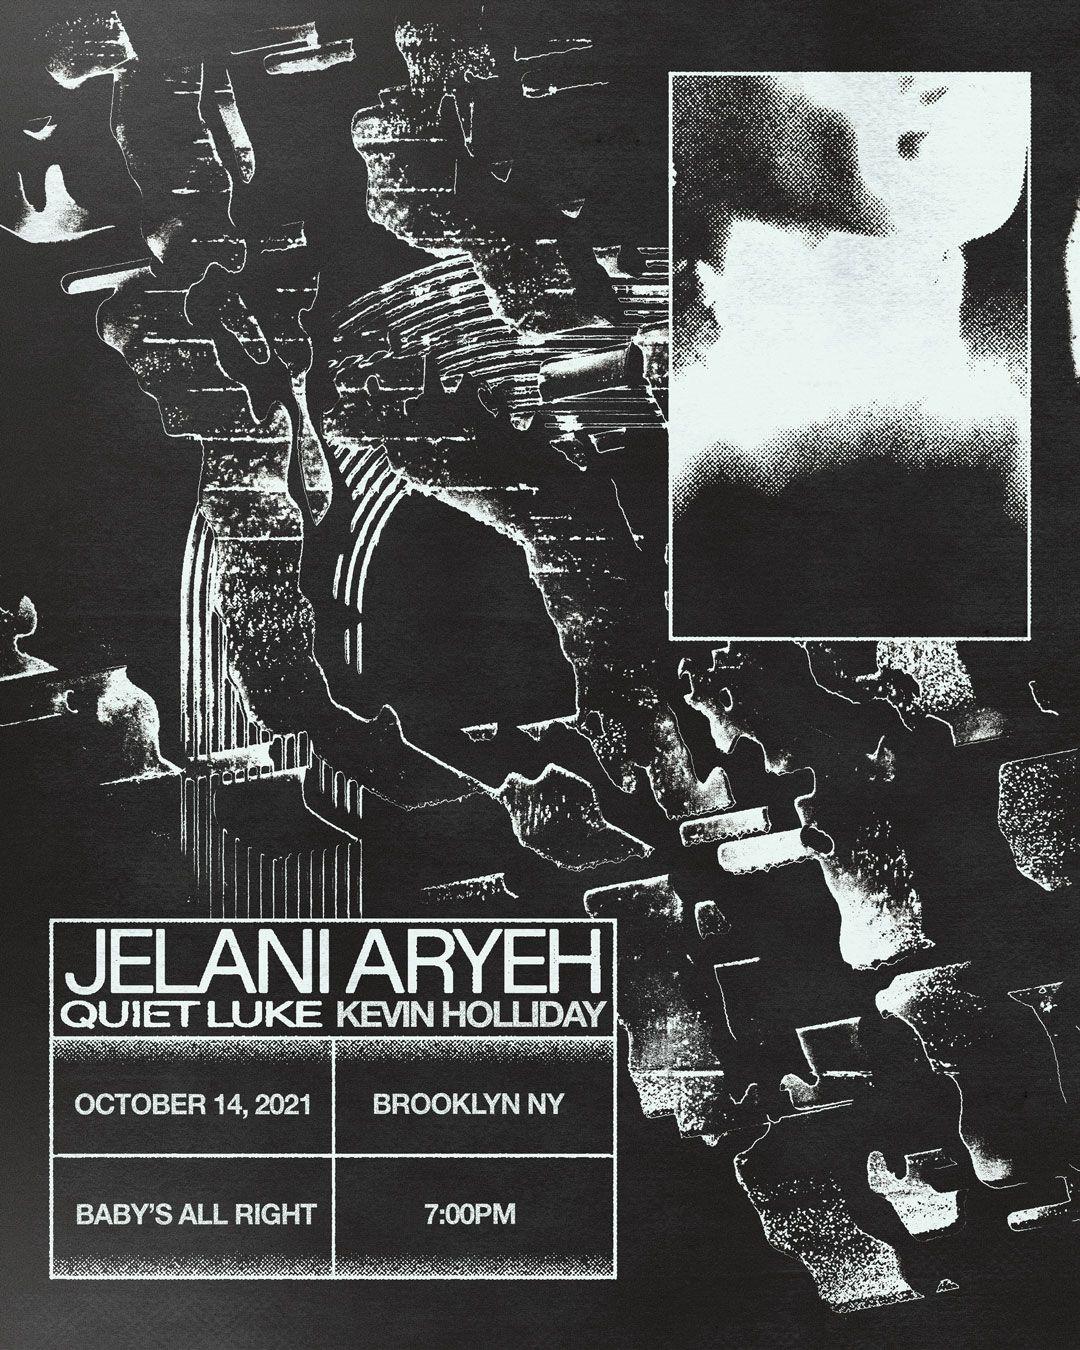 Jelani Aryeh: